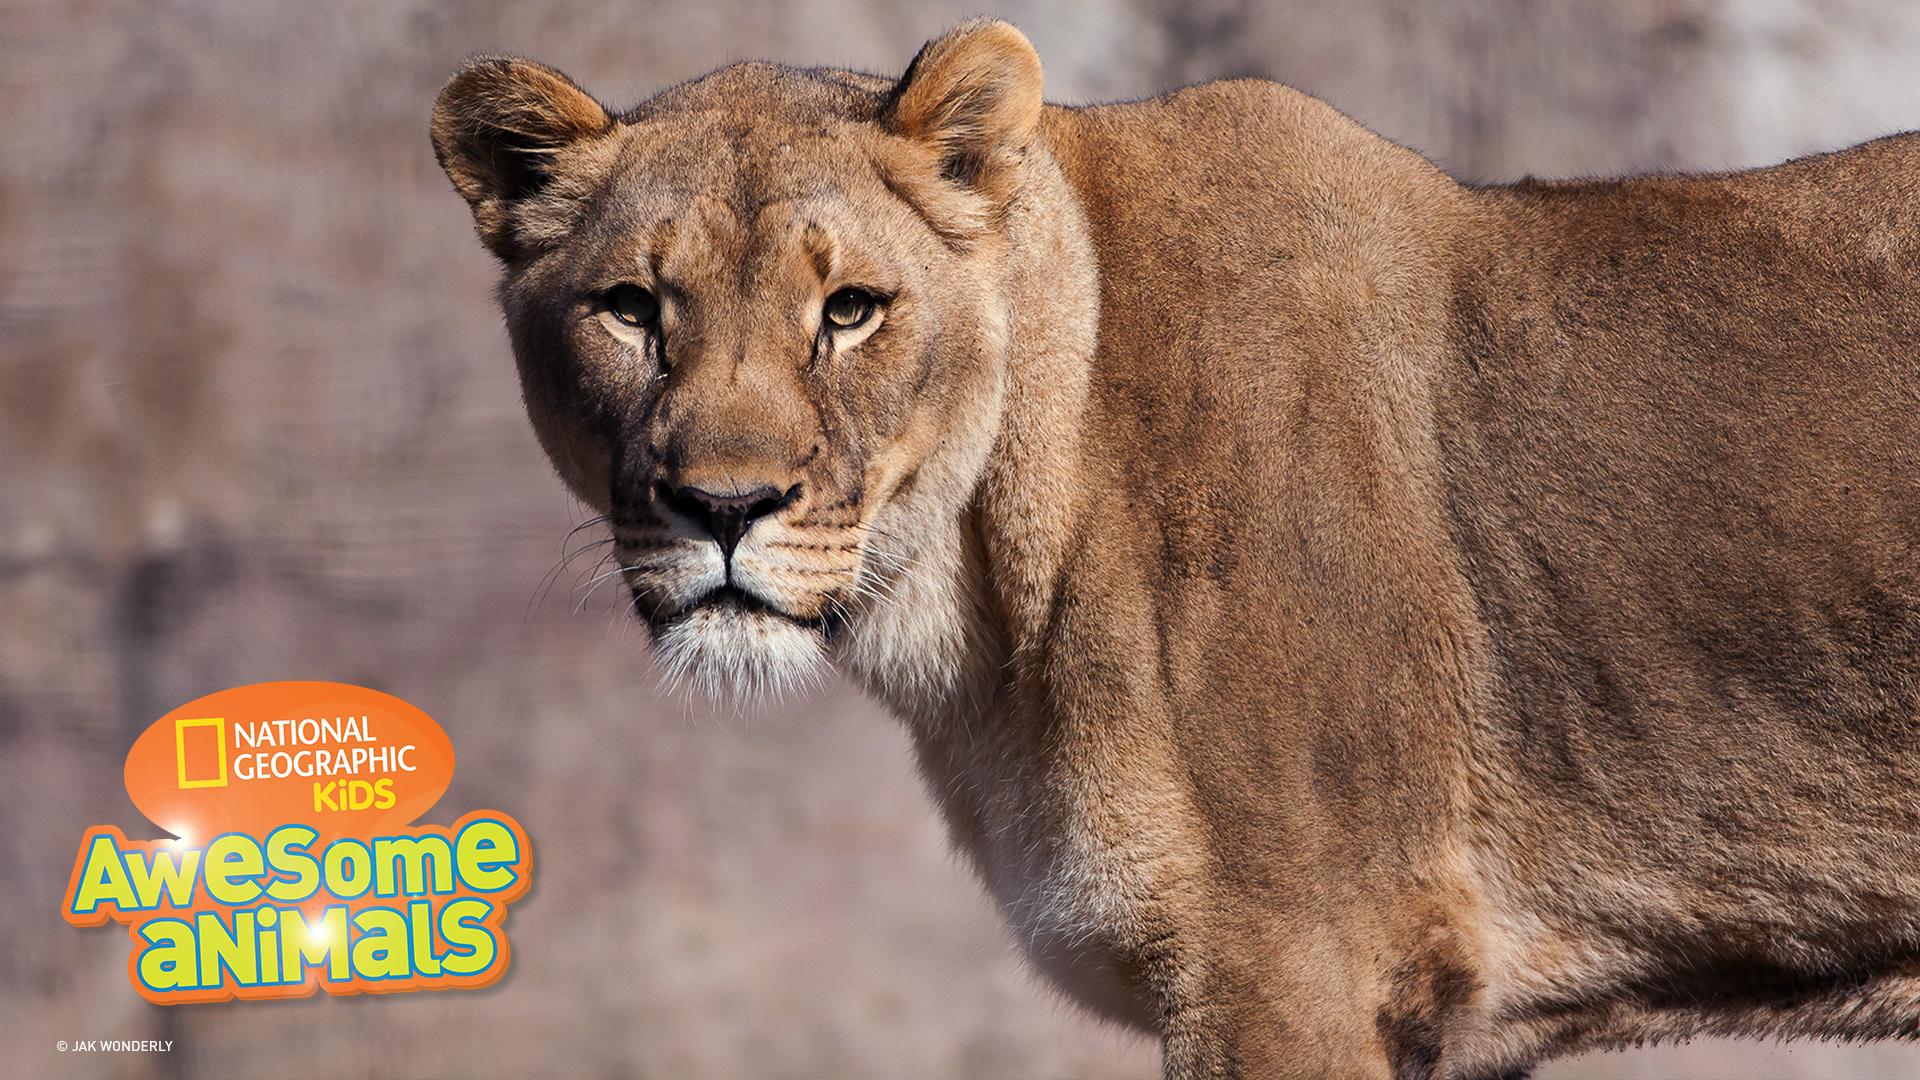 awesome animals s1e10 lion jpg